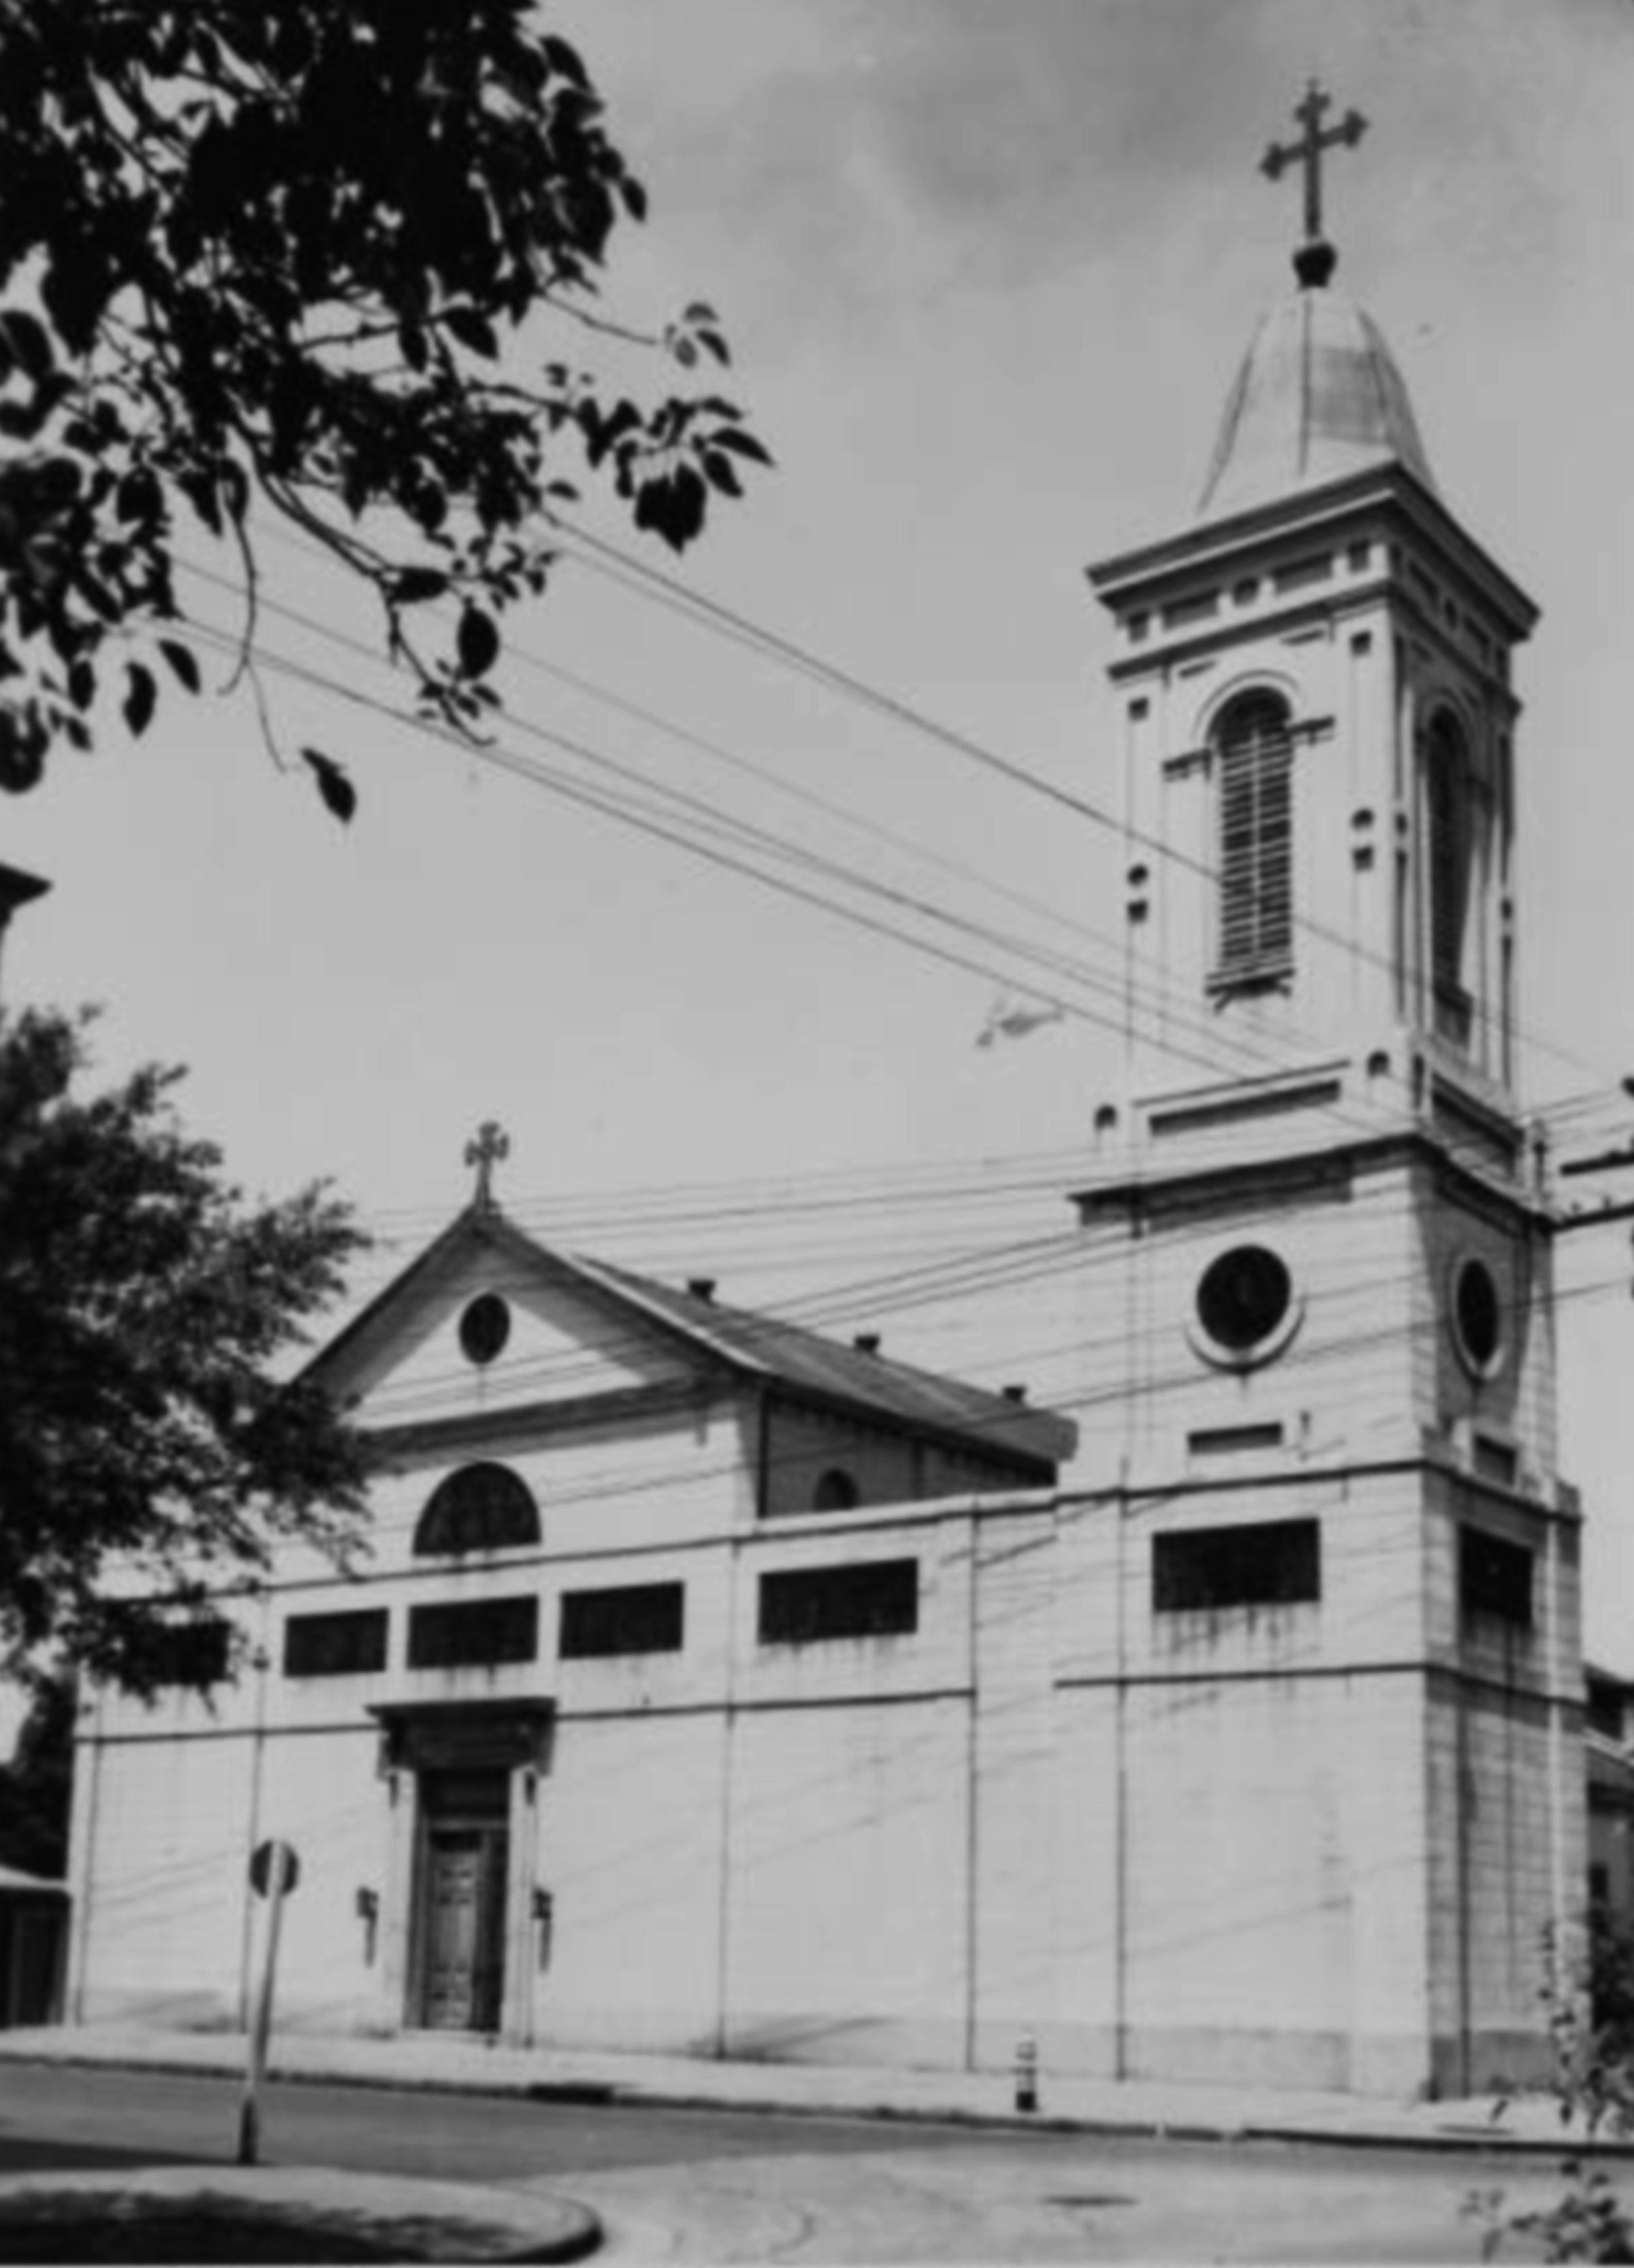 NewOrleansNeighborhoods/St.AugustineChurch1930s.jpg